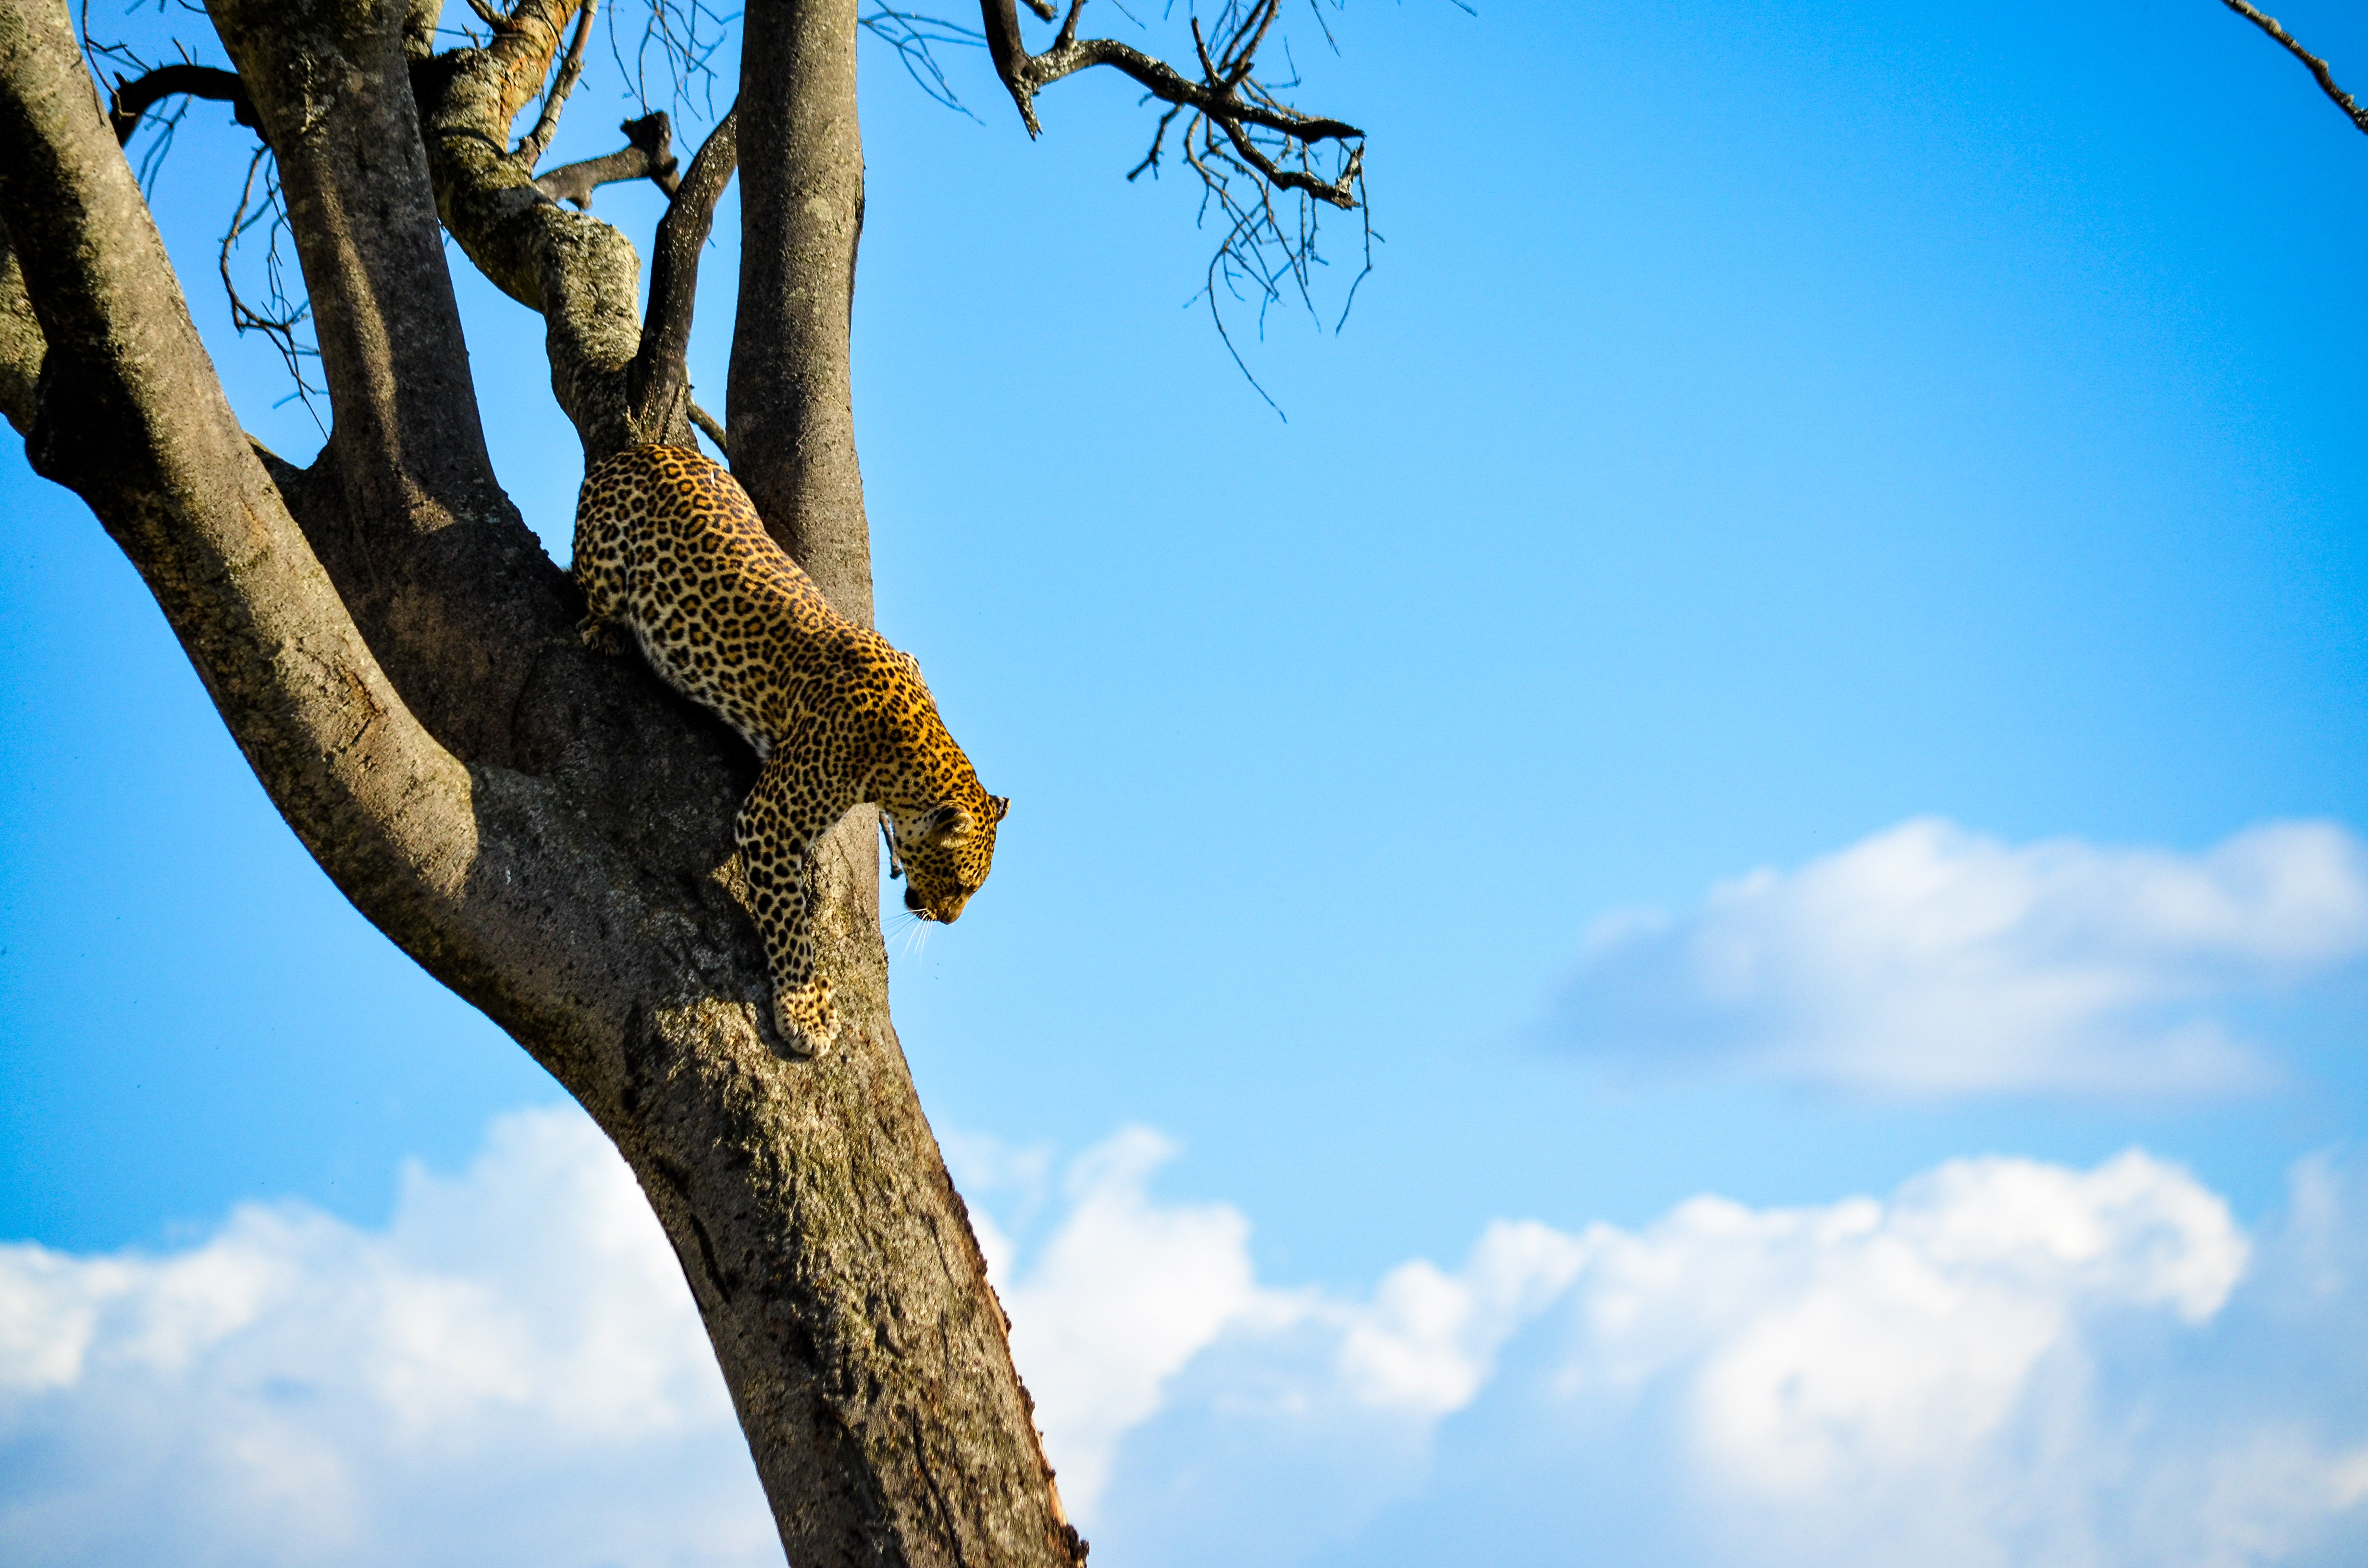 Cheetah on Brown Tree, Low angle shot, Wood, Wildlife, Trunk, HQ Photo